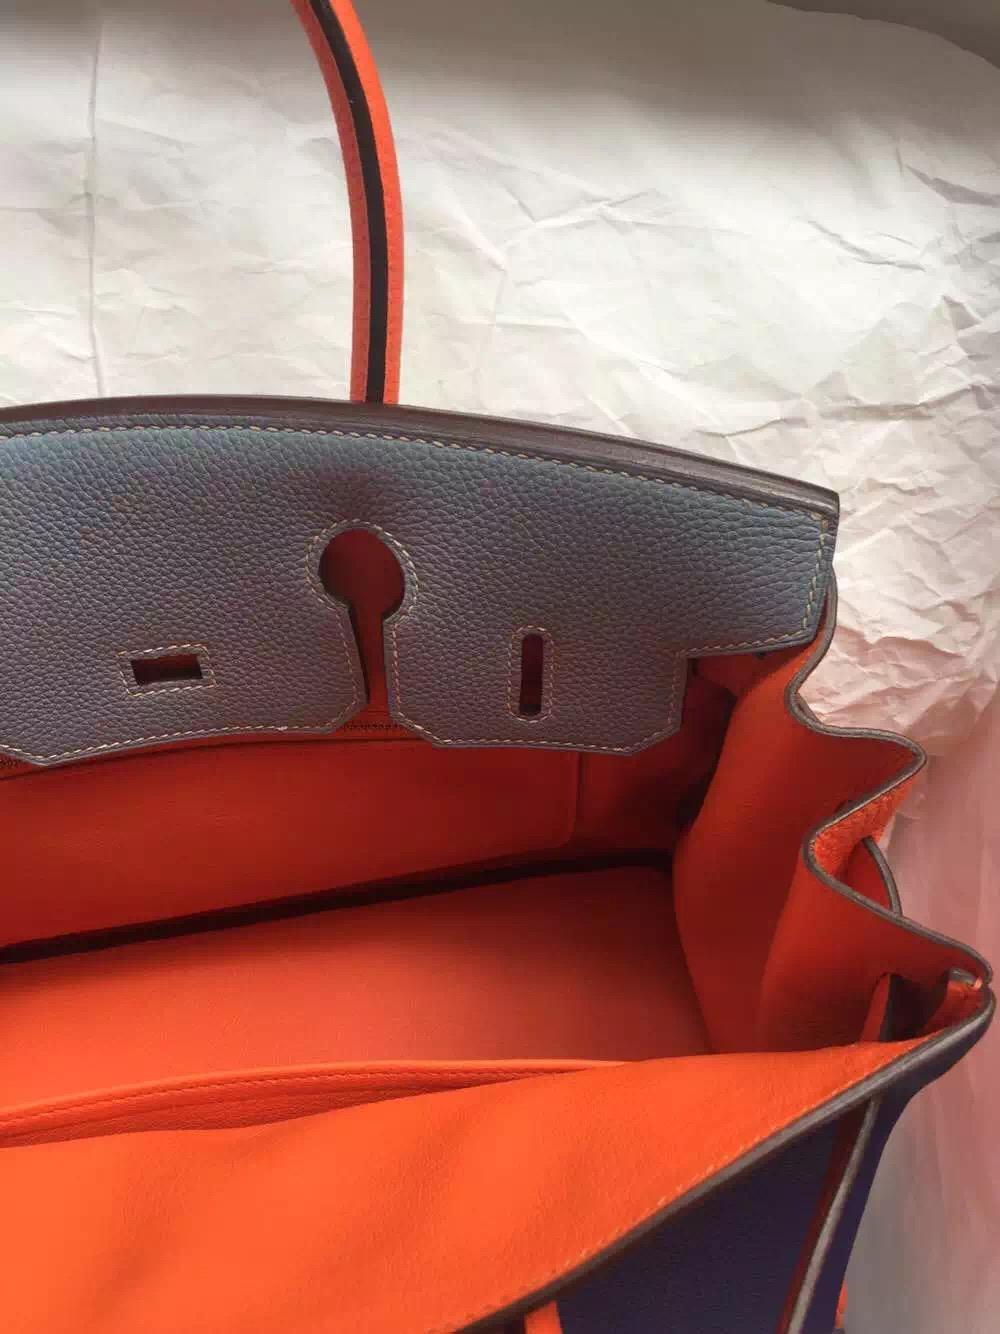 9K Iris Purple/J7 Blue Lin/Orange Togo Leather Hermes Birkin Bag 30cm